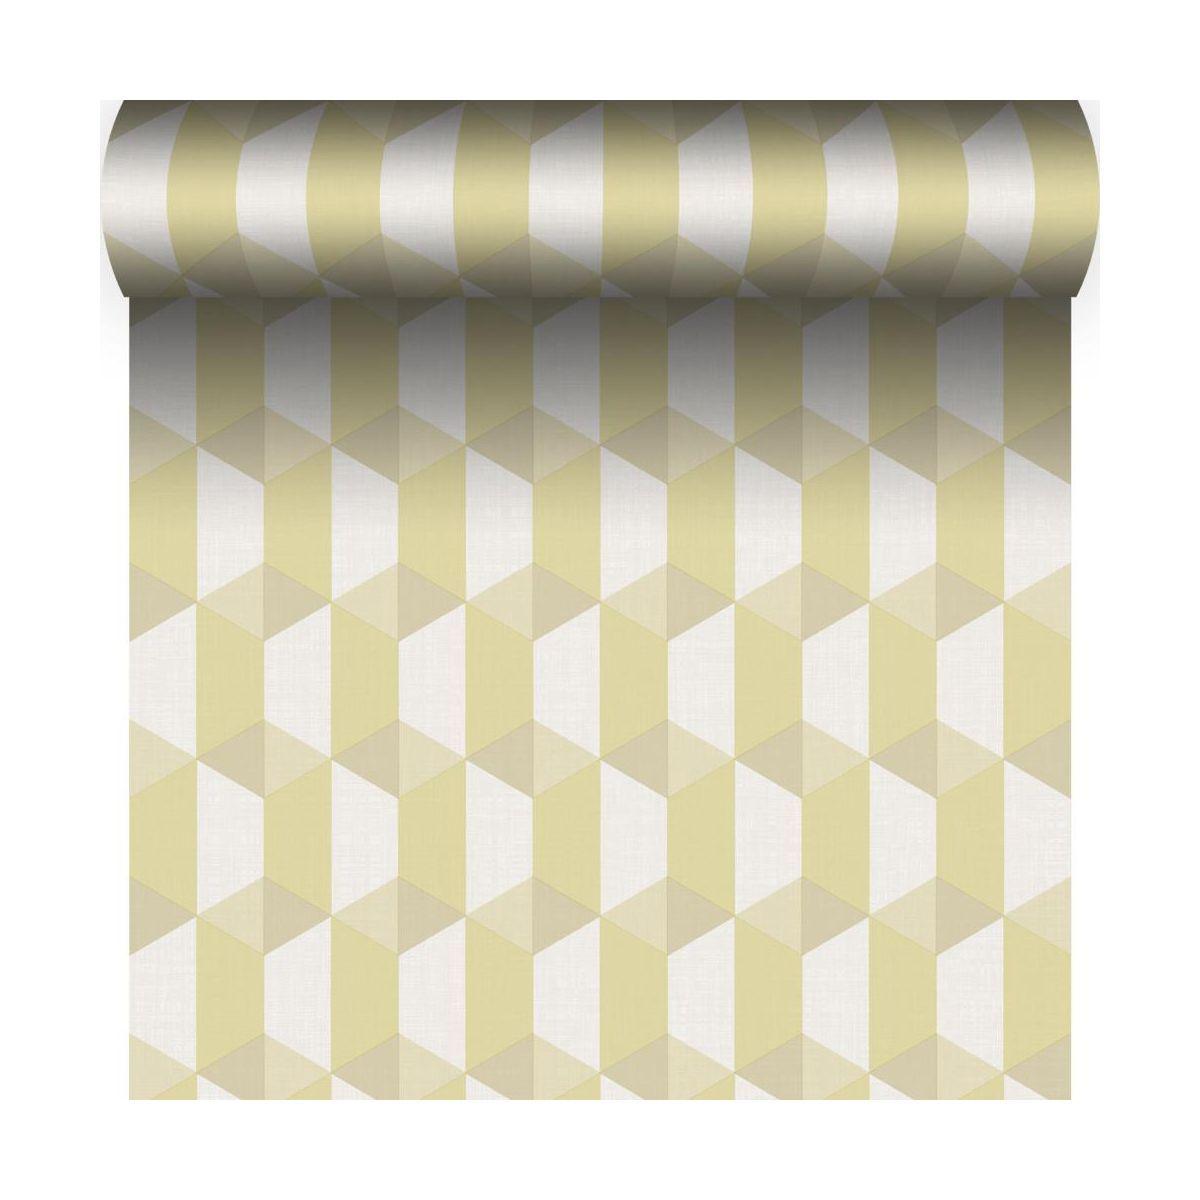 Tapeta Celia Grandeco Tapety Na Sciane W Atrakcyjnej Cenie W Sklepach Leroy Merlin Decorative Boxes Decor Home Decor